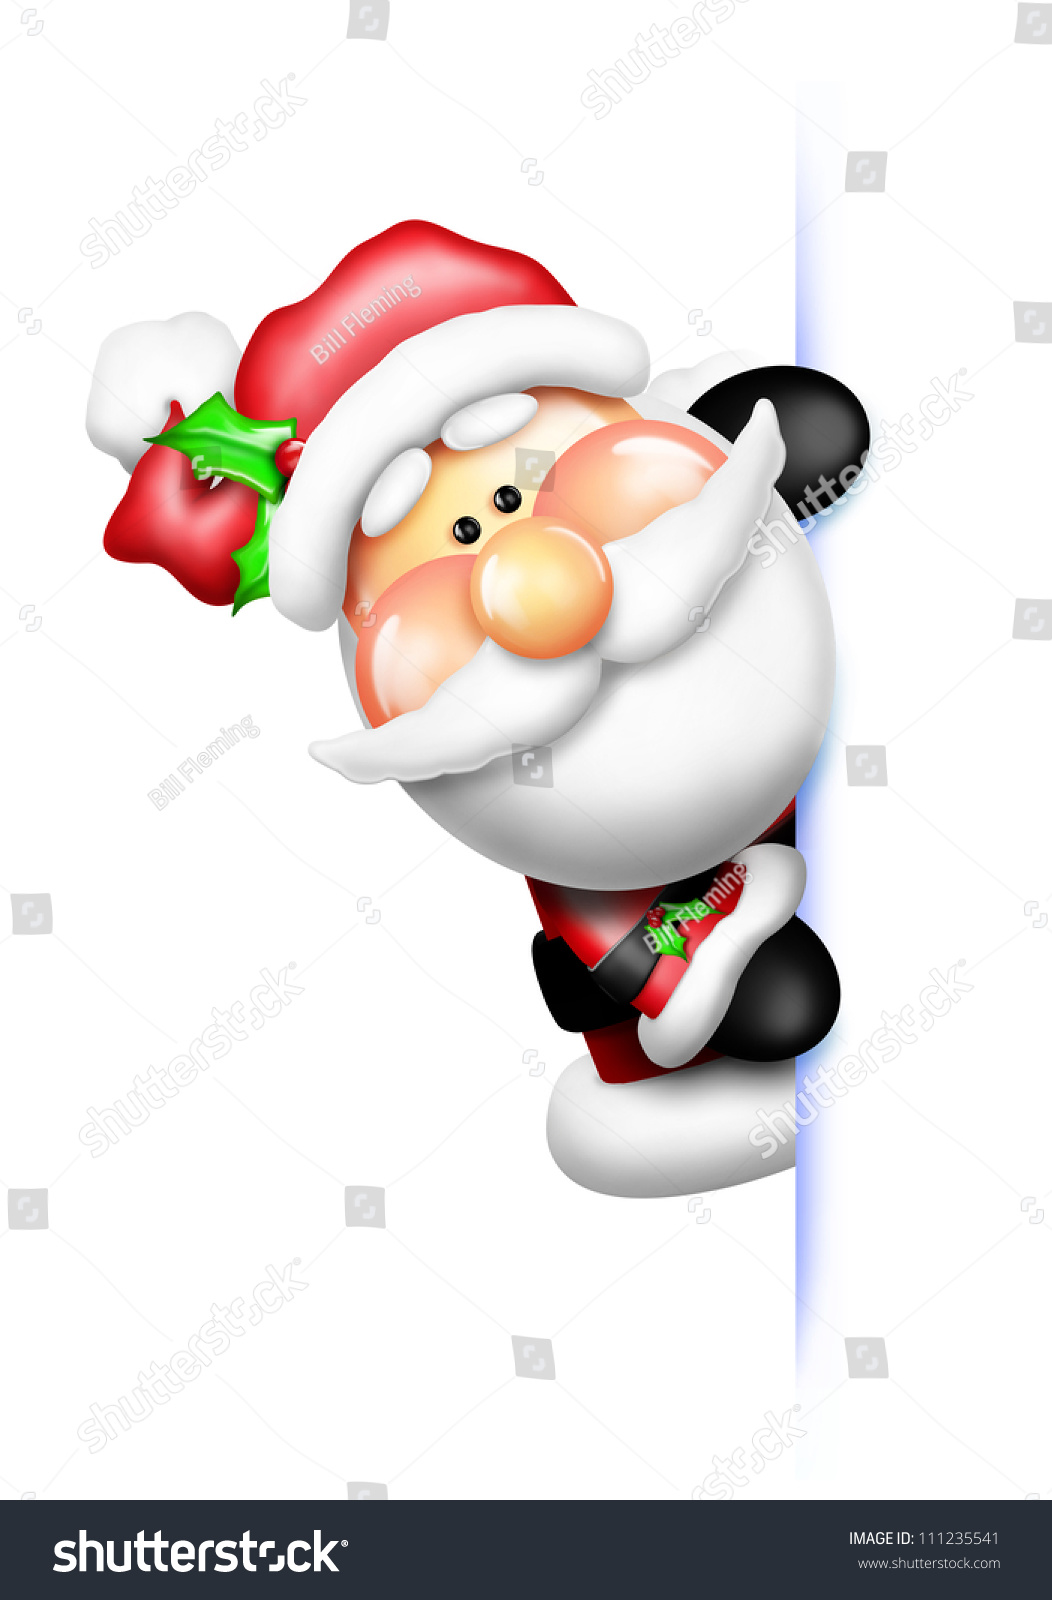 Whimsical cartoon santa peeking around corner stock